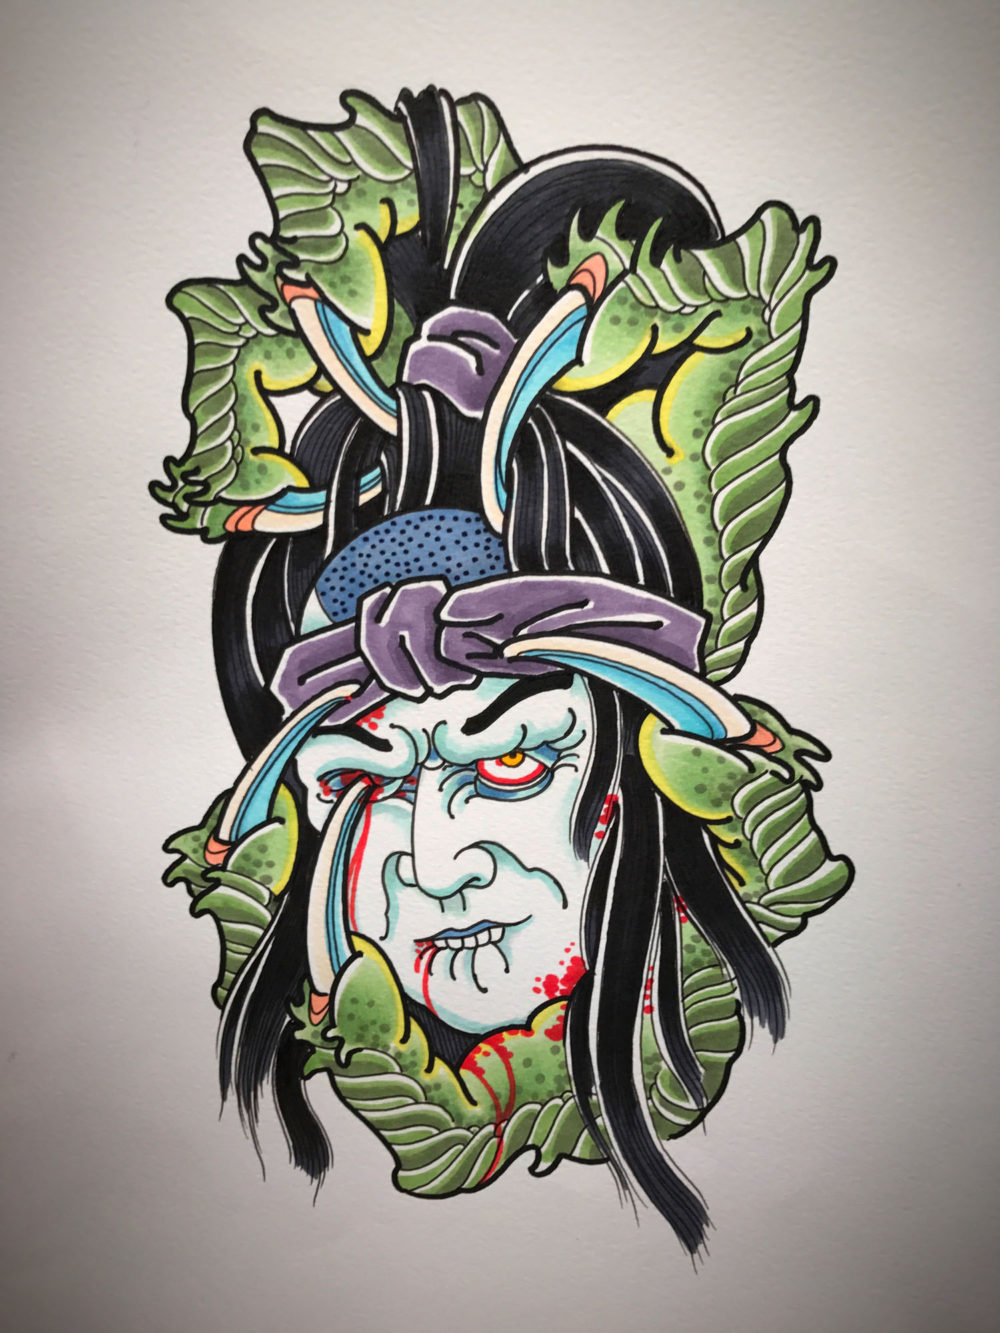 Claws and Head Tattoo Illustration